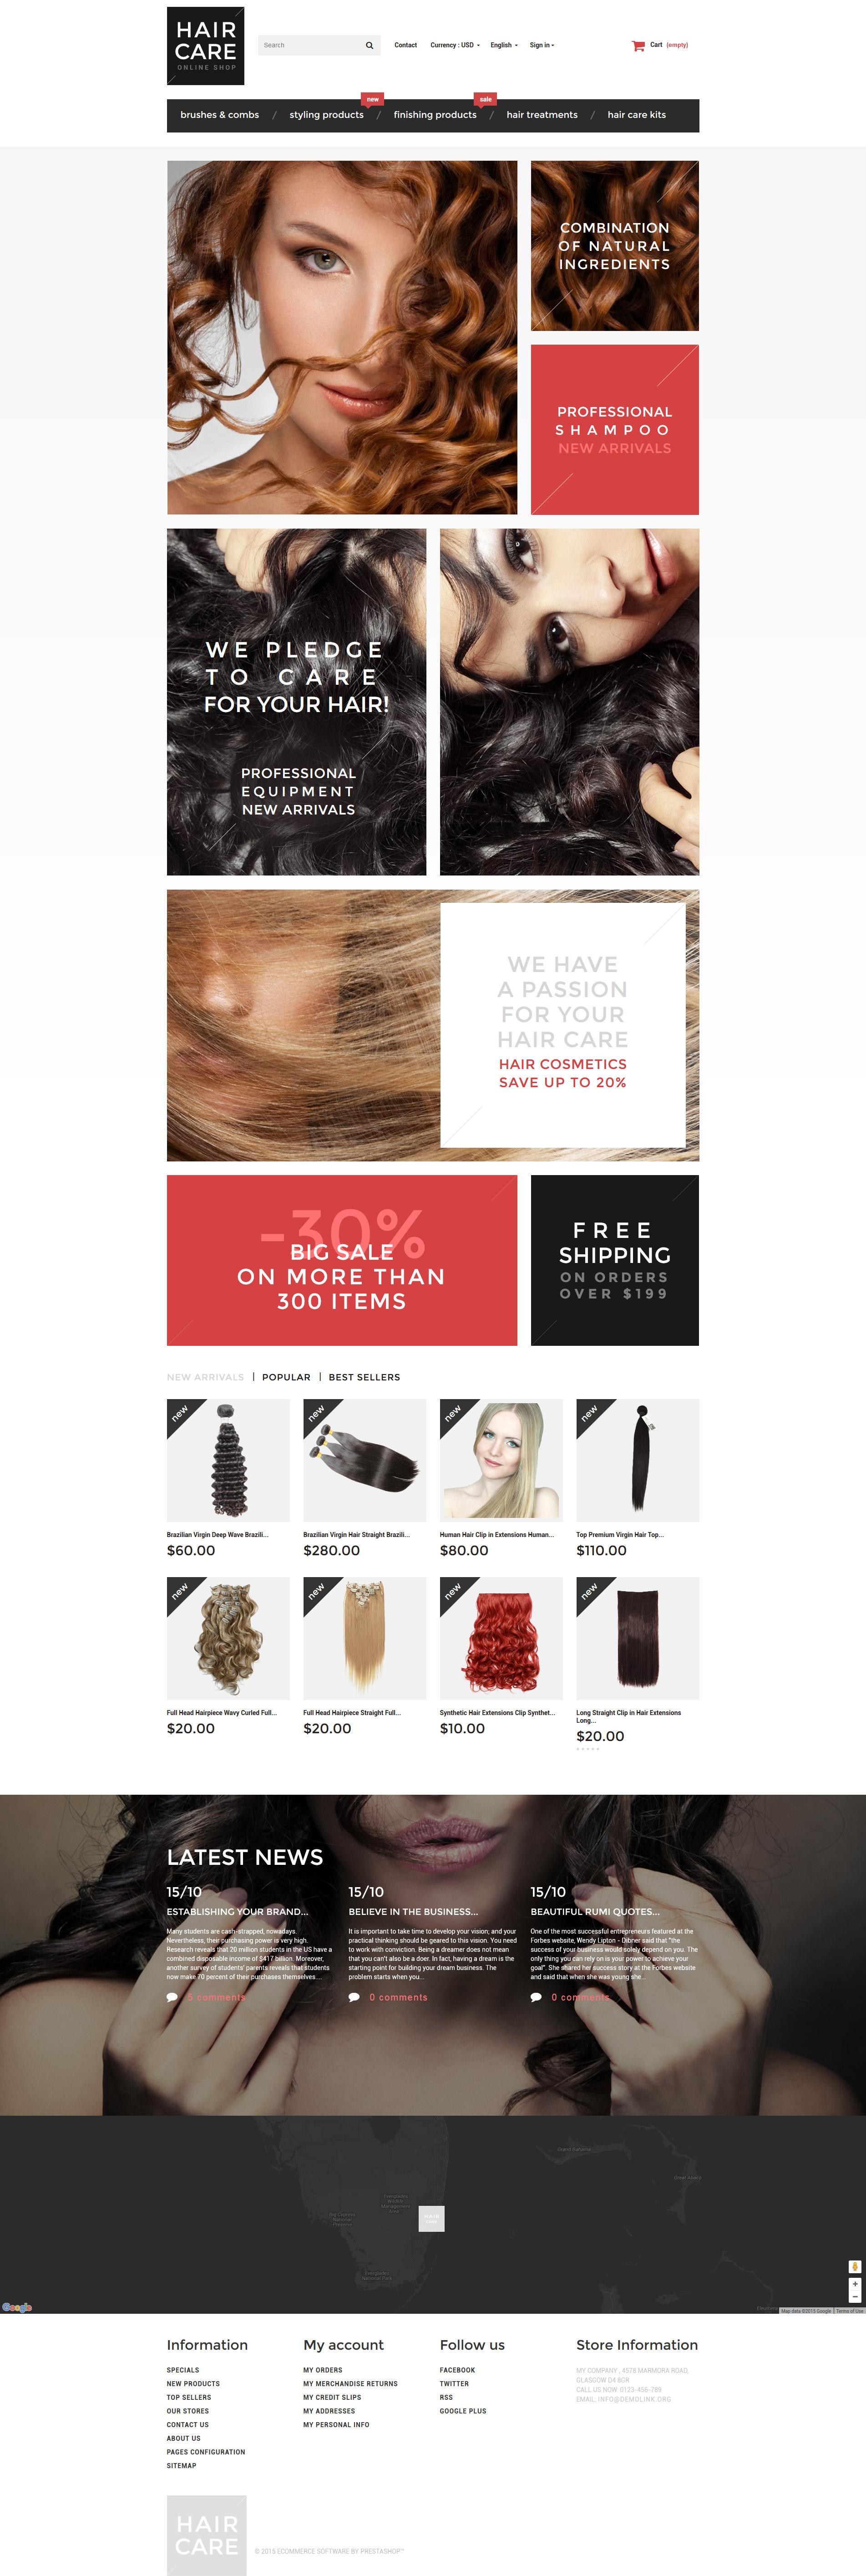 Hair Gloss №55757 - скриншот